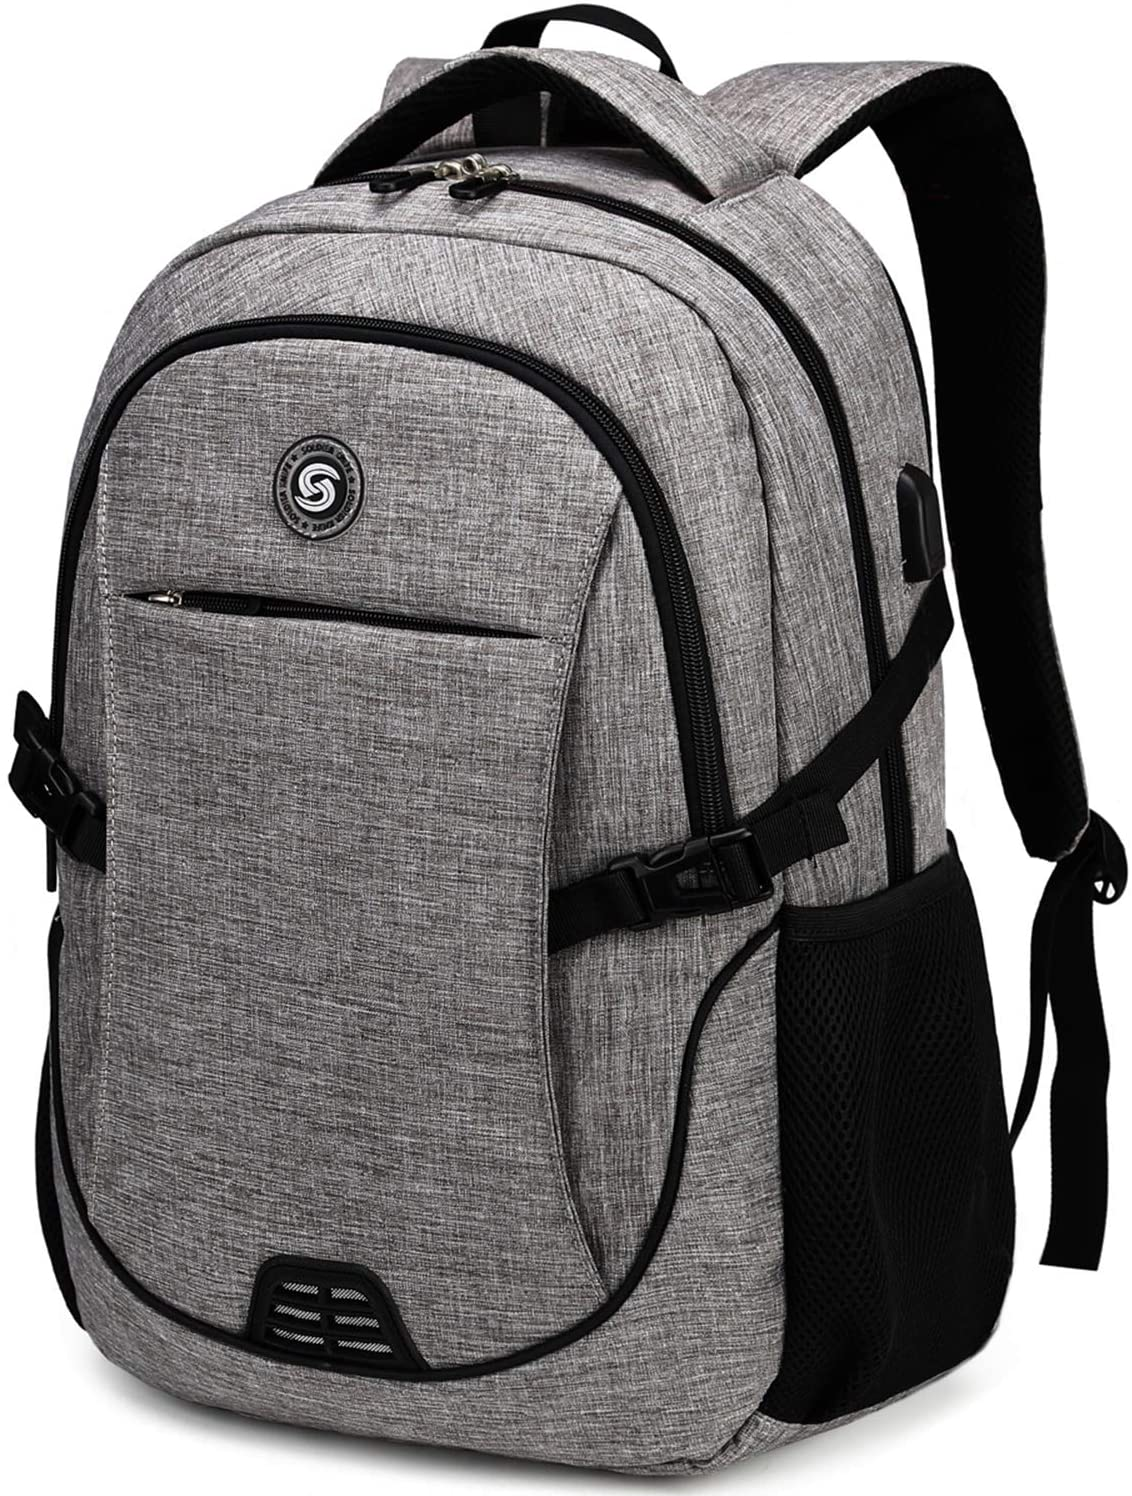 SHRRADOO Anti Theft Laptop Backpack Travel Backpacks Bookbag with usb Charging Port